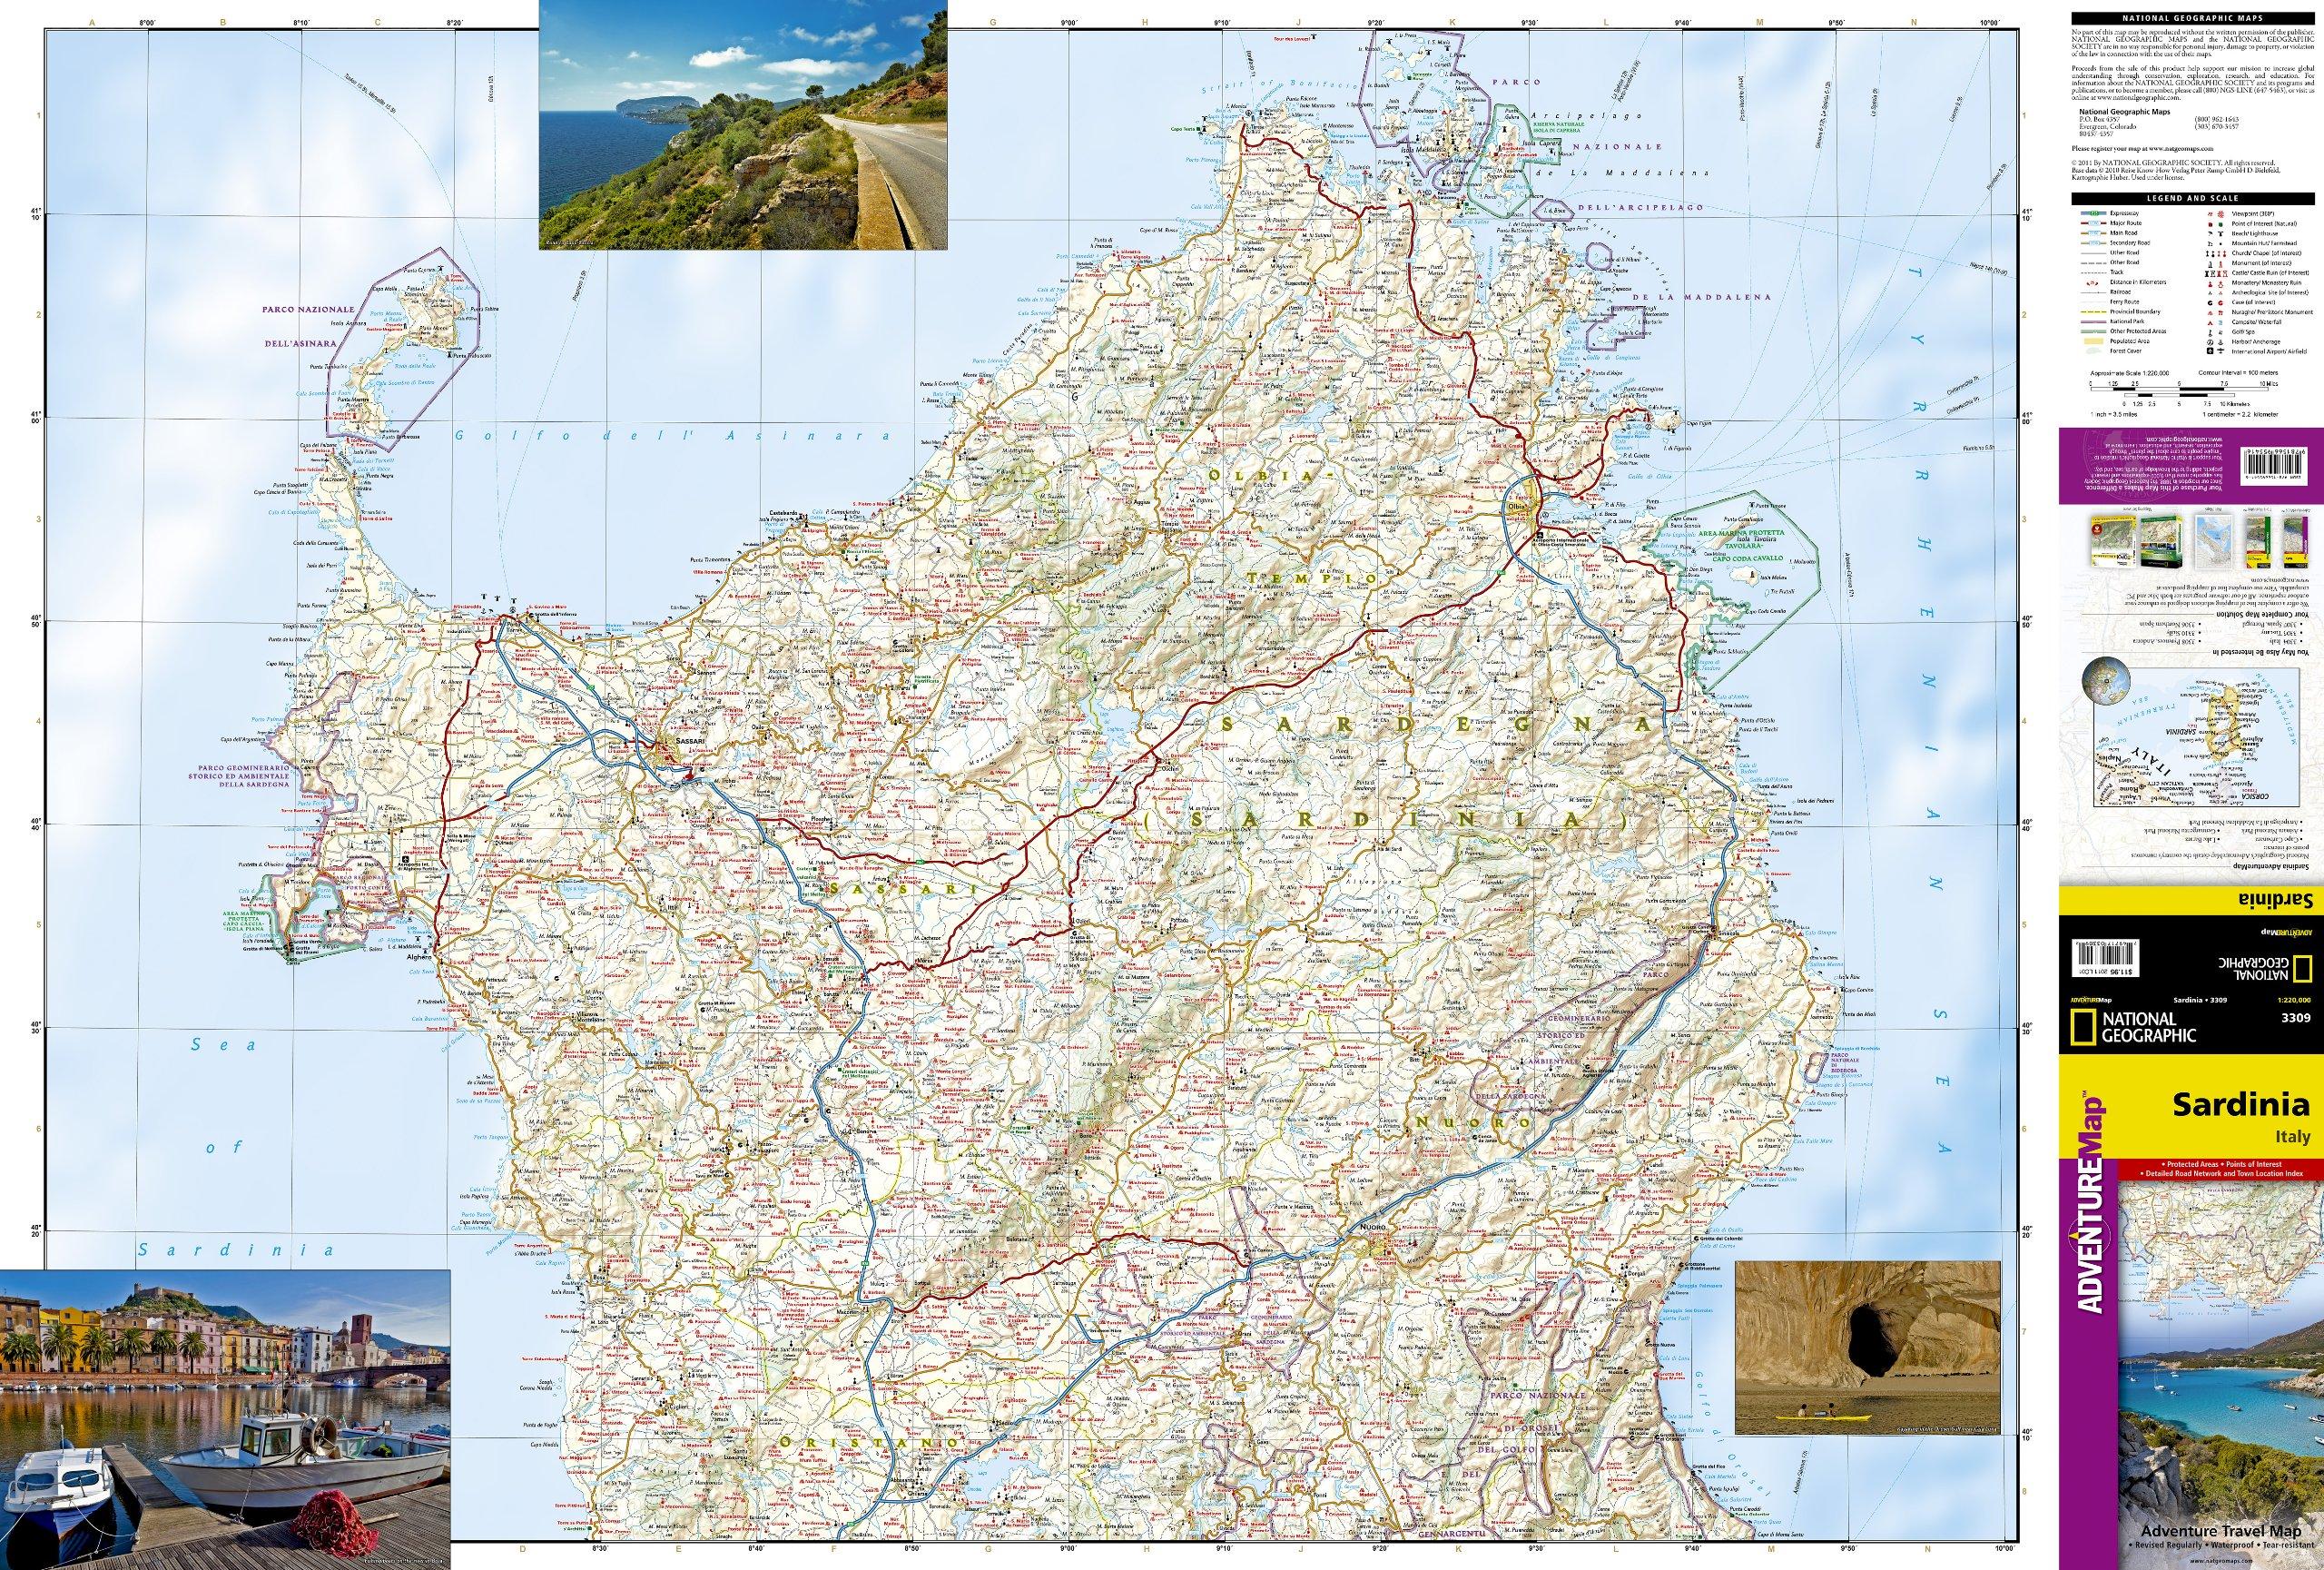 unique media maps wegenkaart landkaart  trails illustrated sardiniasardini  national geographic. unique media maps aardman animations directory ac description